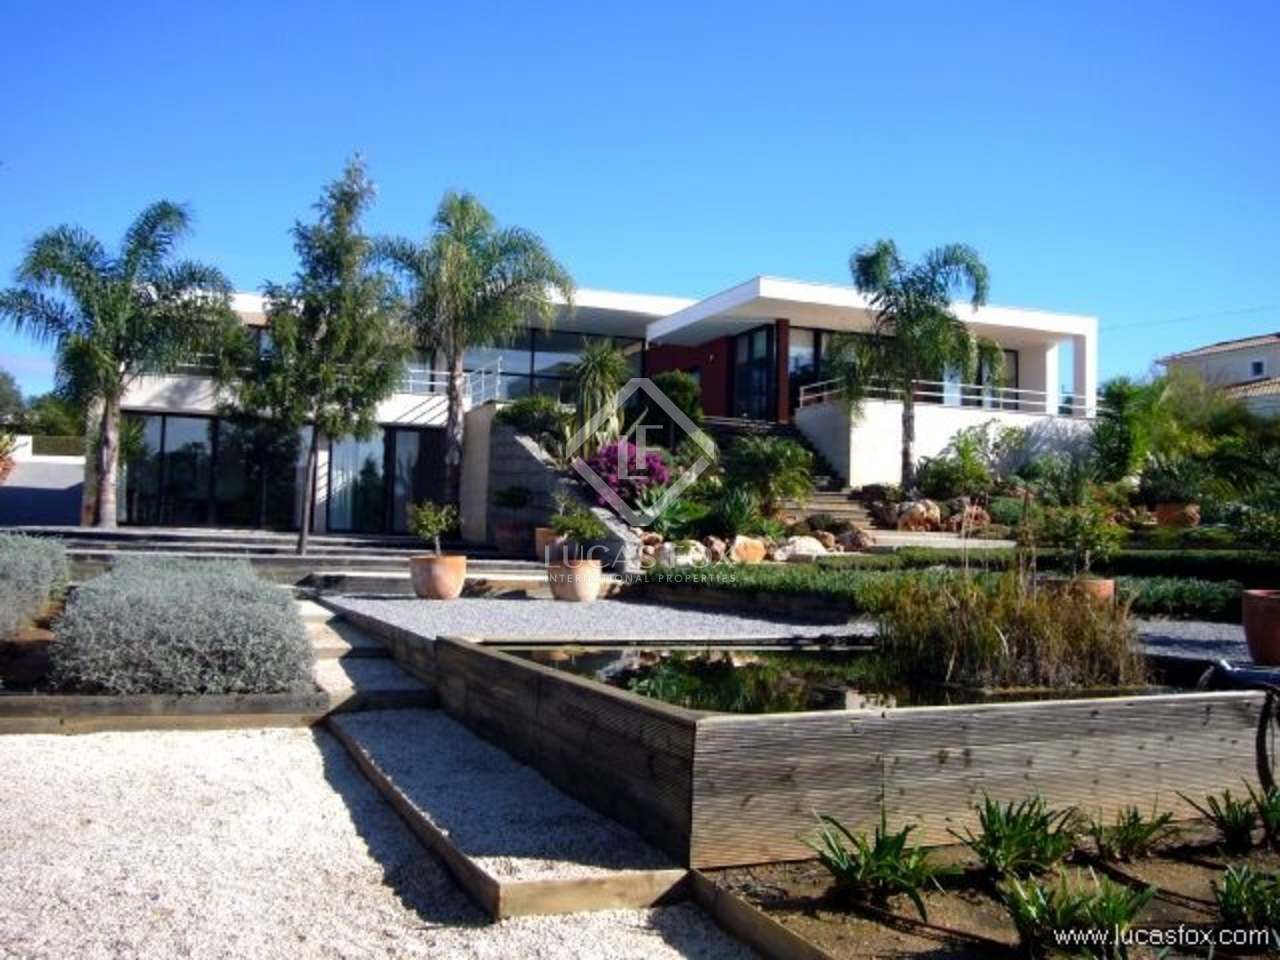 450m haus villa zum verkauf in algarve portugal. Black Bedroom Furniture Sets. Home Design Ideas